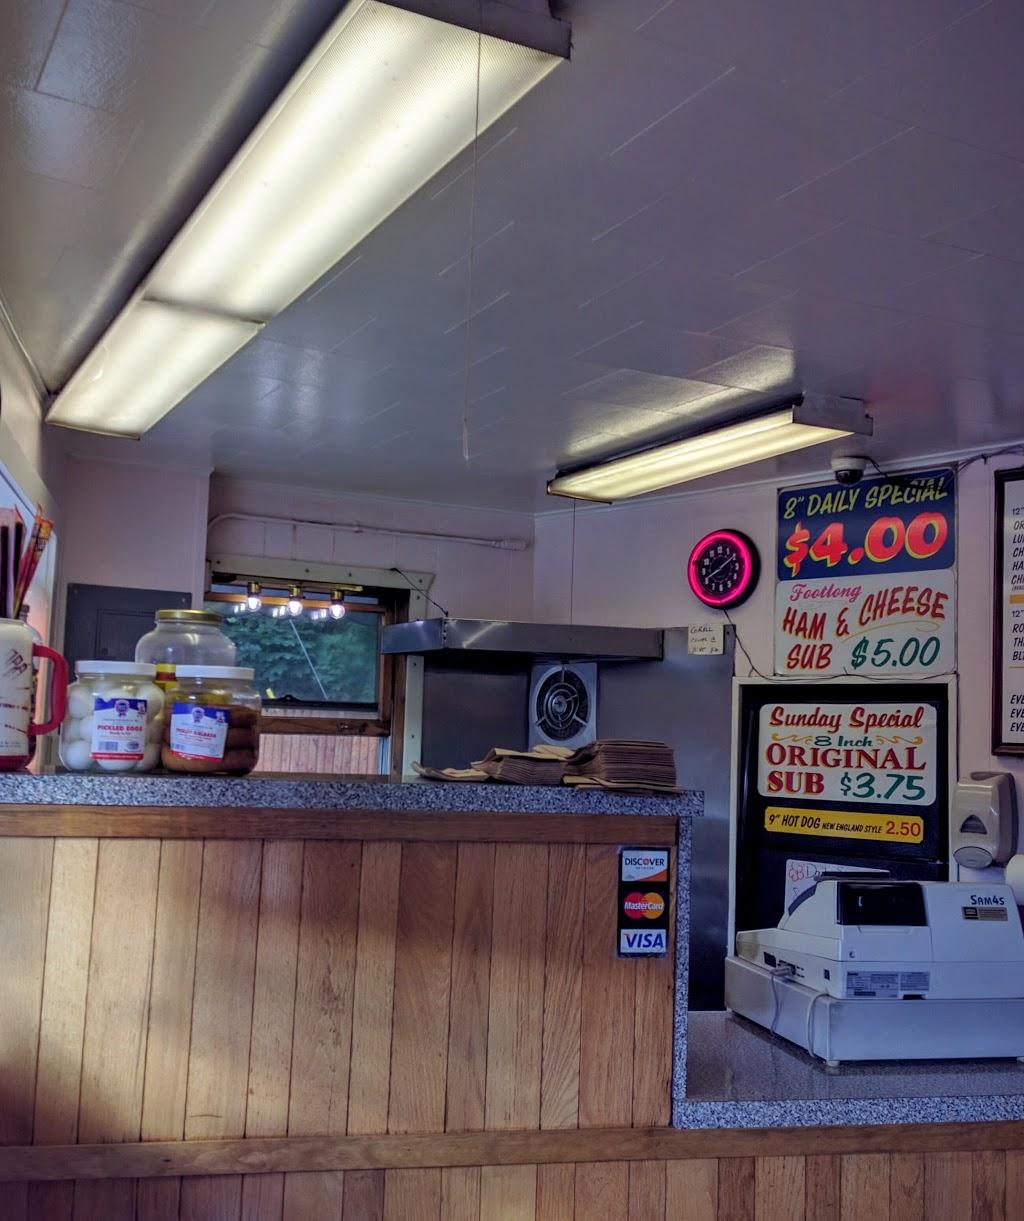 Angelinas Submarine Shop - meal takeaway  | Photo 5 of 9 | Address: 34 1/2 Columbia St, Adams, MA 01220, USA | Phone: (413) 743-9744